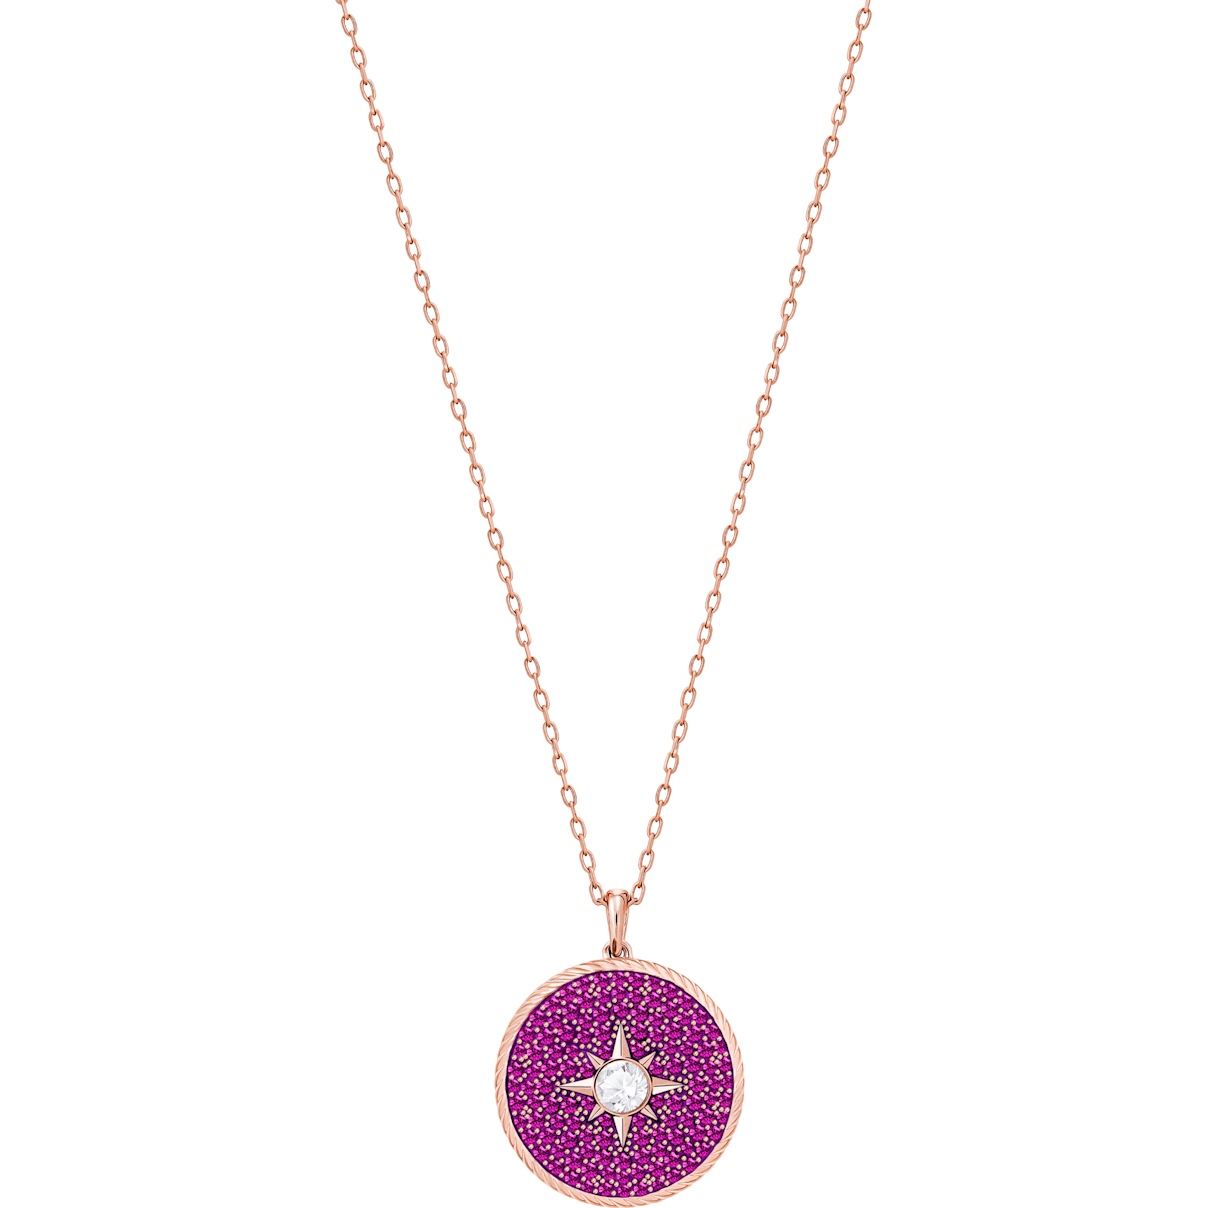 Swarovski Locket Pendant, Pink, Rose-gold tone plated